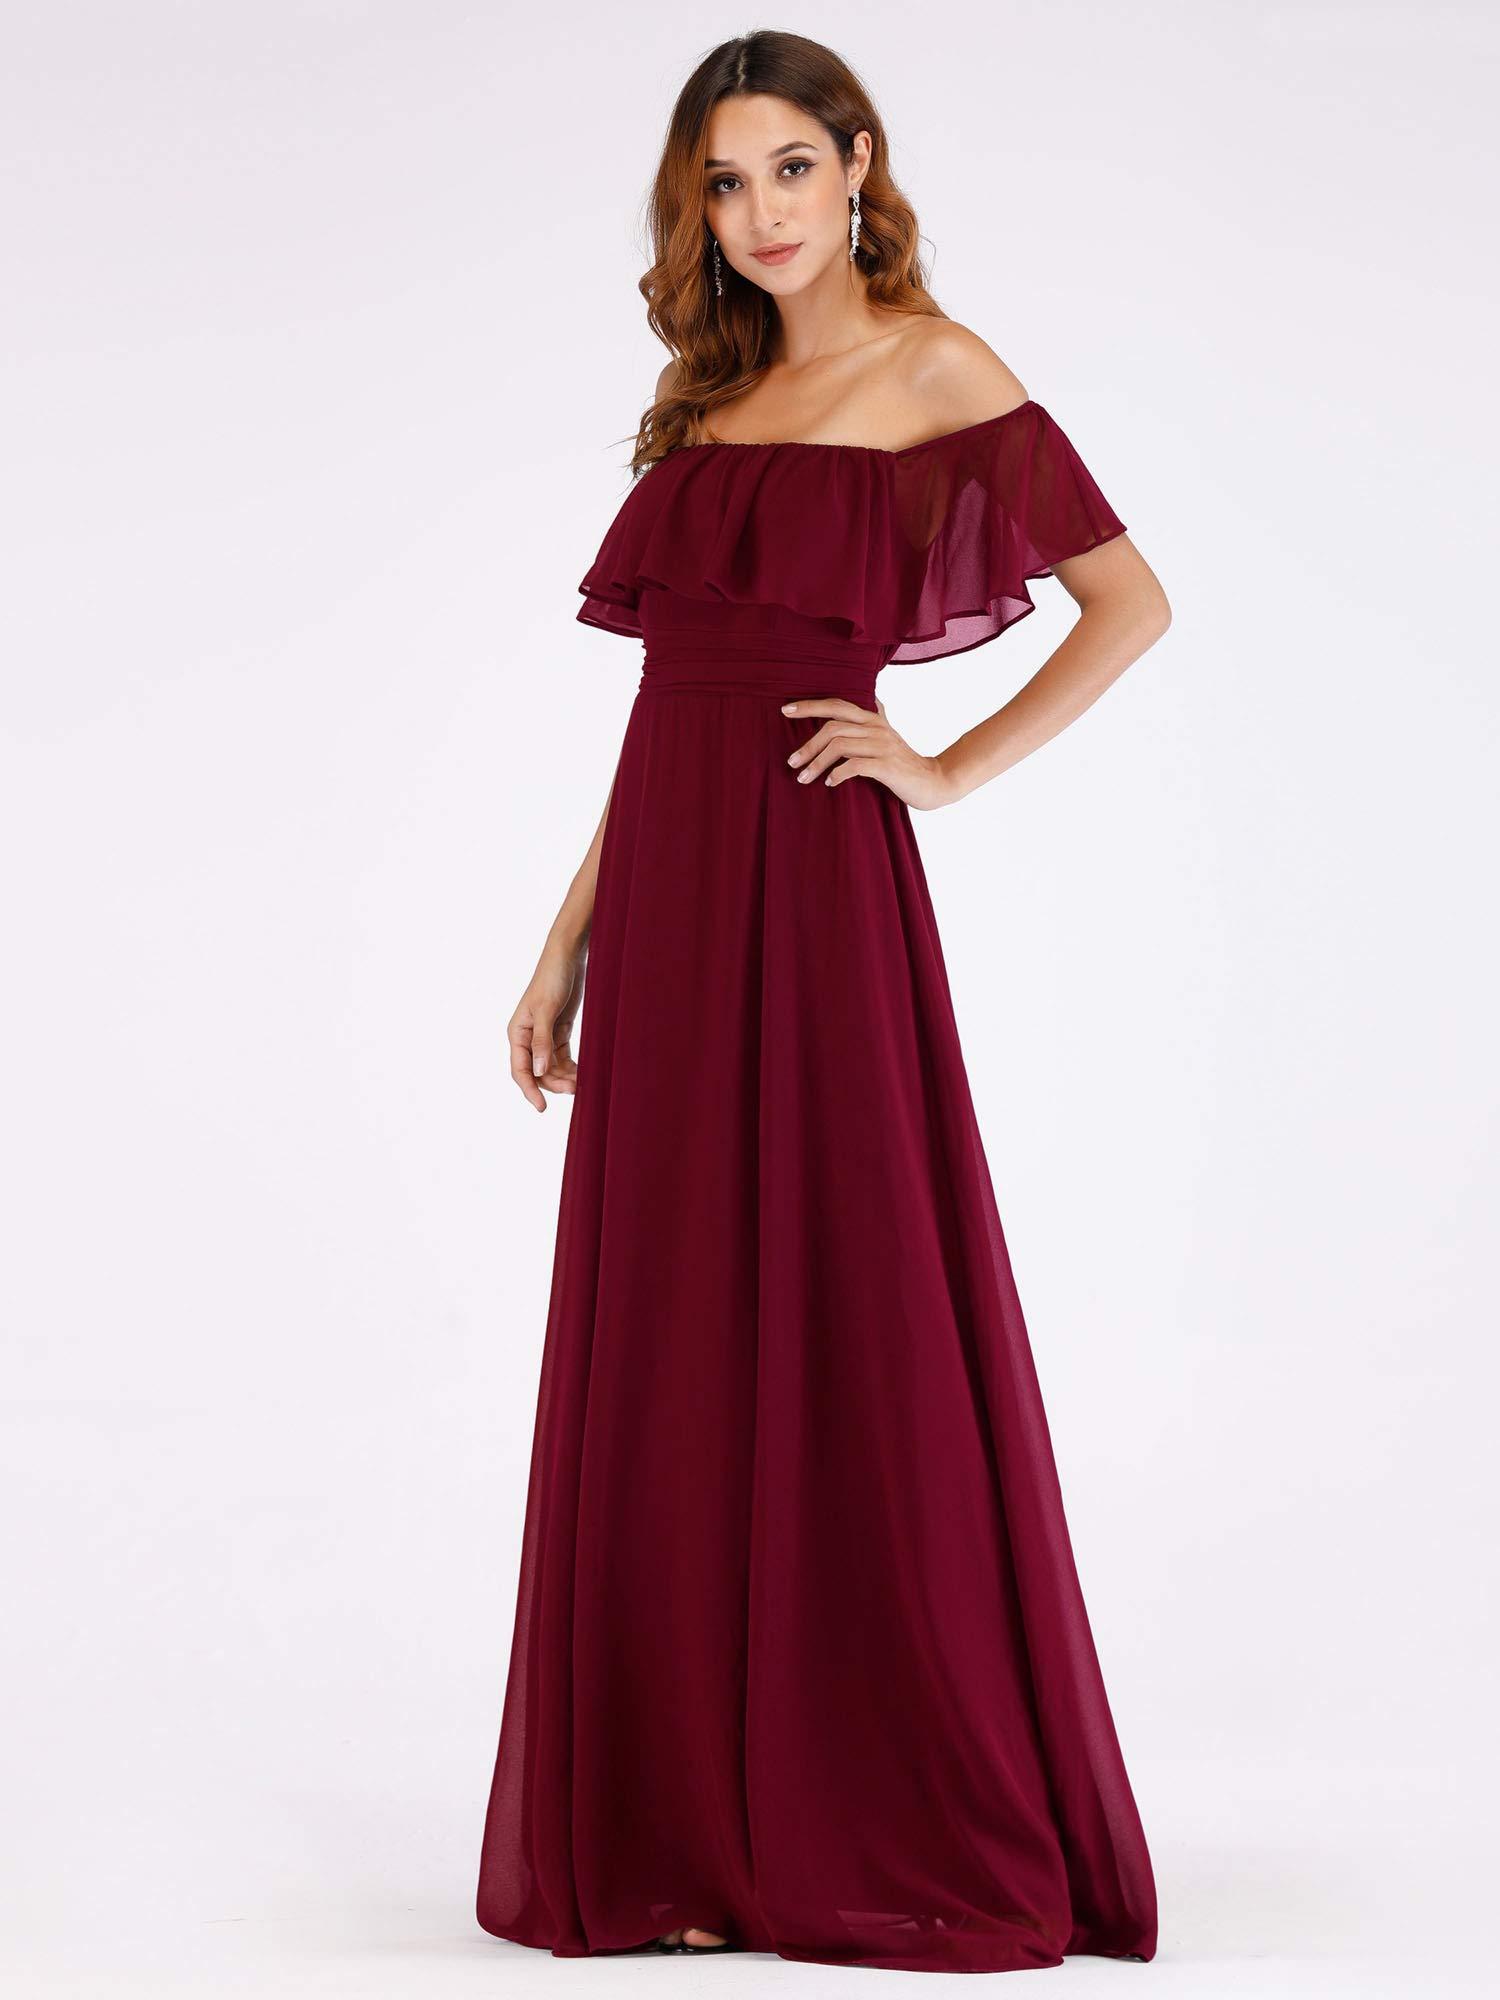 Women\'s Evening Gowns Wedding Guest Dresses for Women Plus Size Burgundy  US22